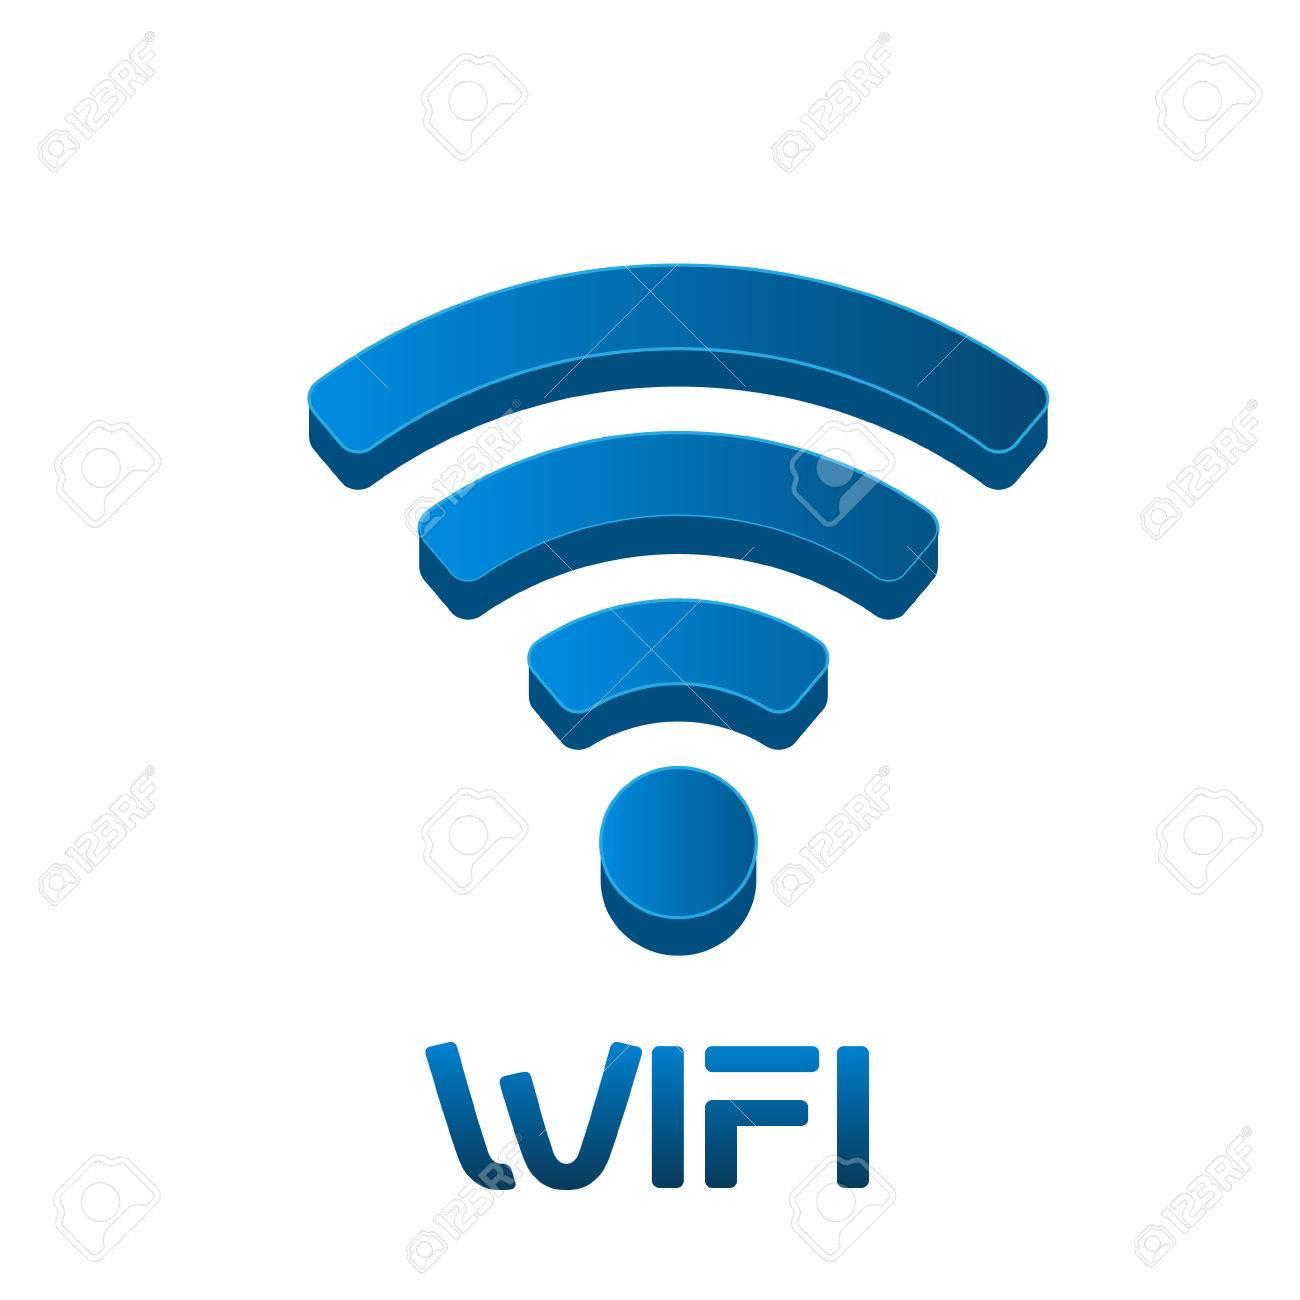 Wireless Network Signal Logo. Vector graphic design - 56118806